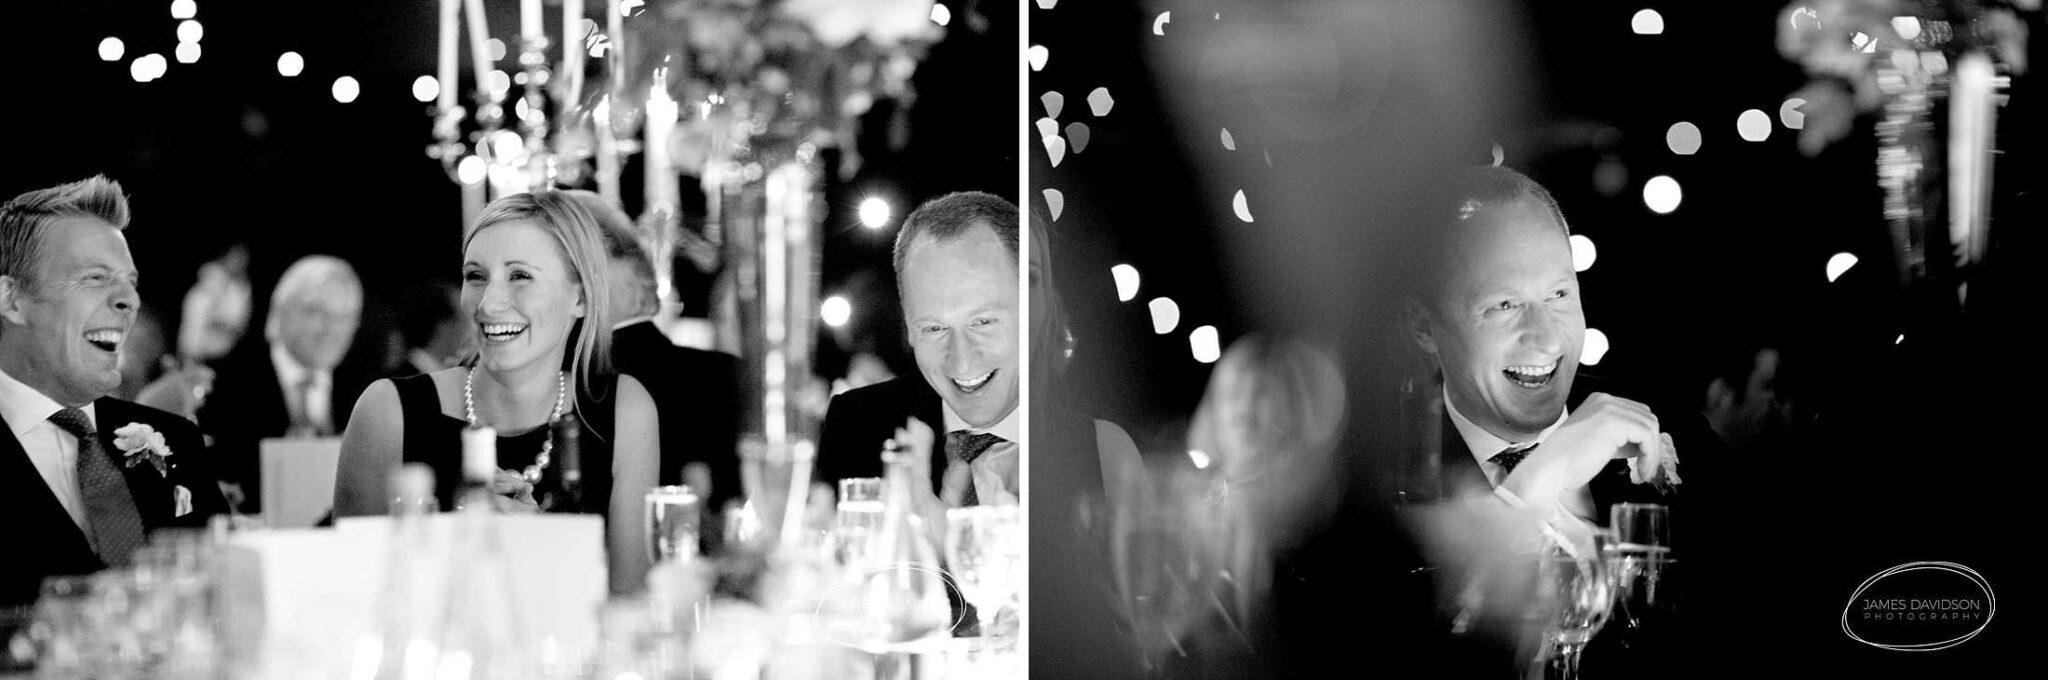 huddersfield-wedding-photography-029